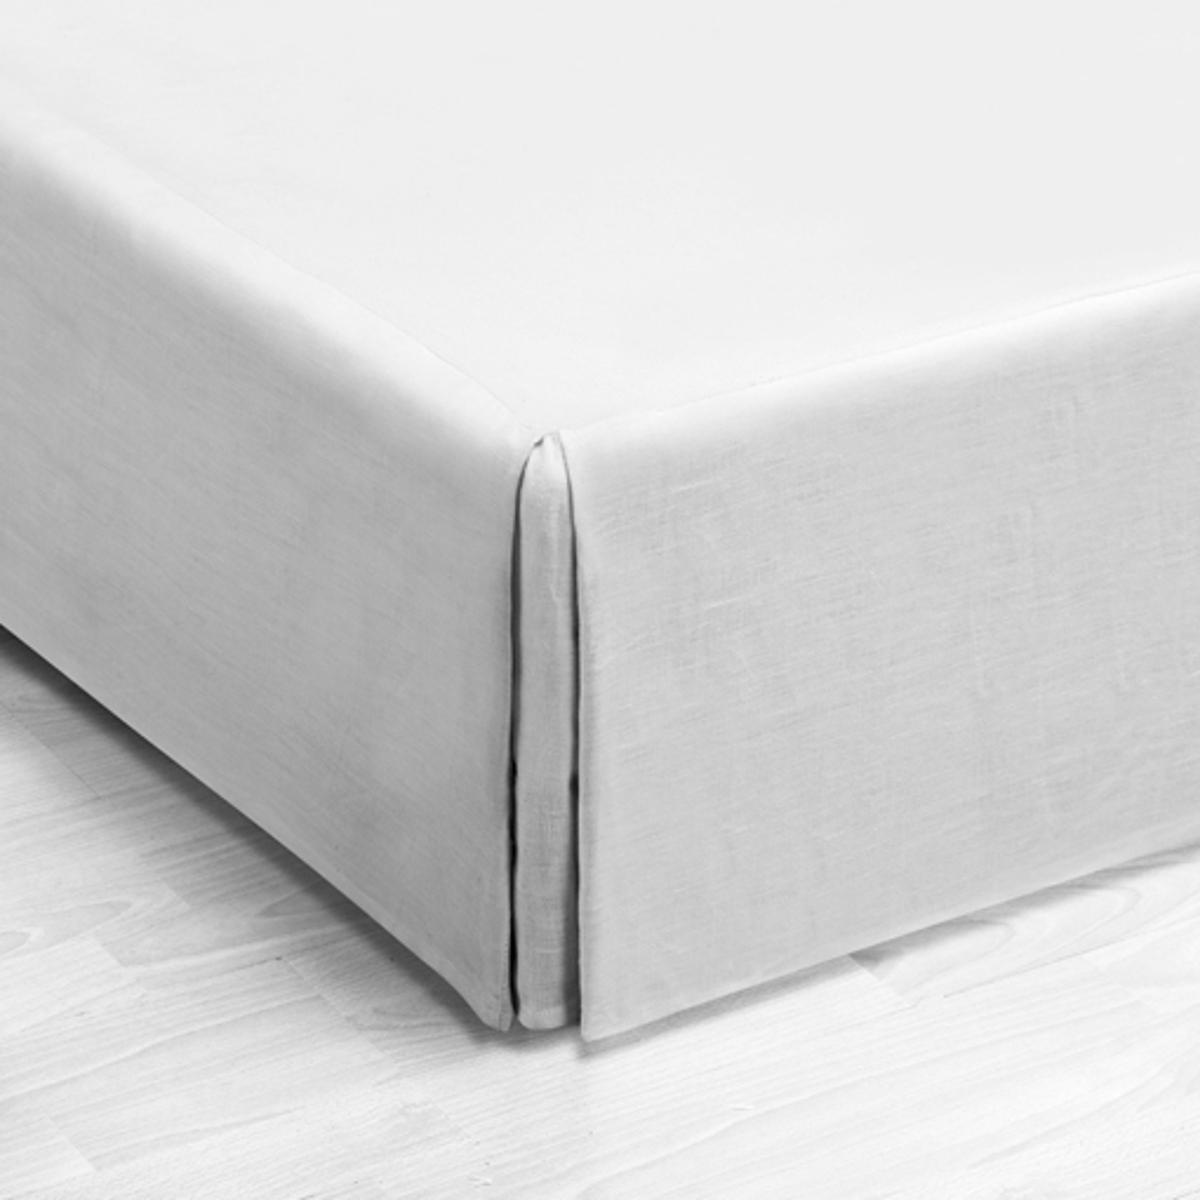 Чехол La Redoute Для кровати из льна Touril 90 x 190 см белый изголовье la redoute кровати из льна в см yliana 140 см бежевый